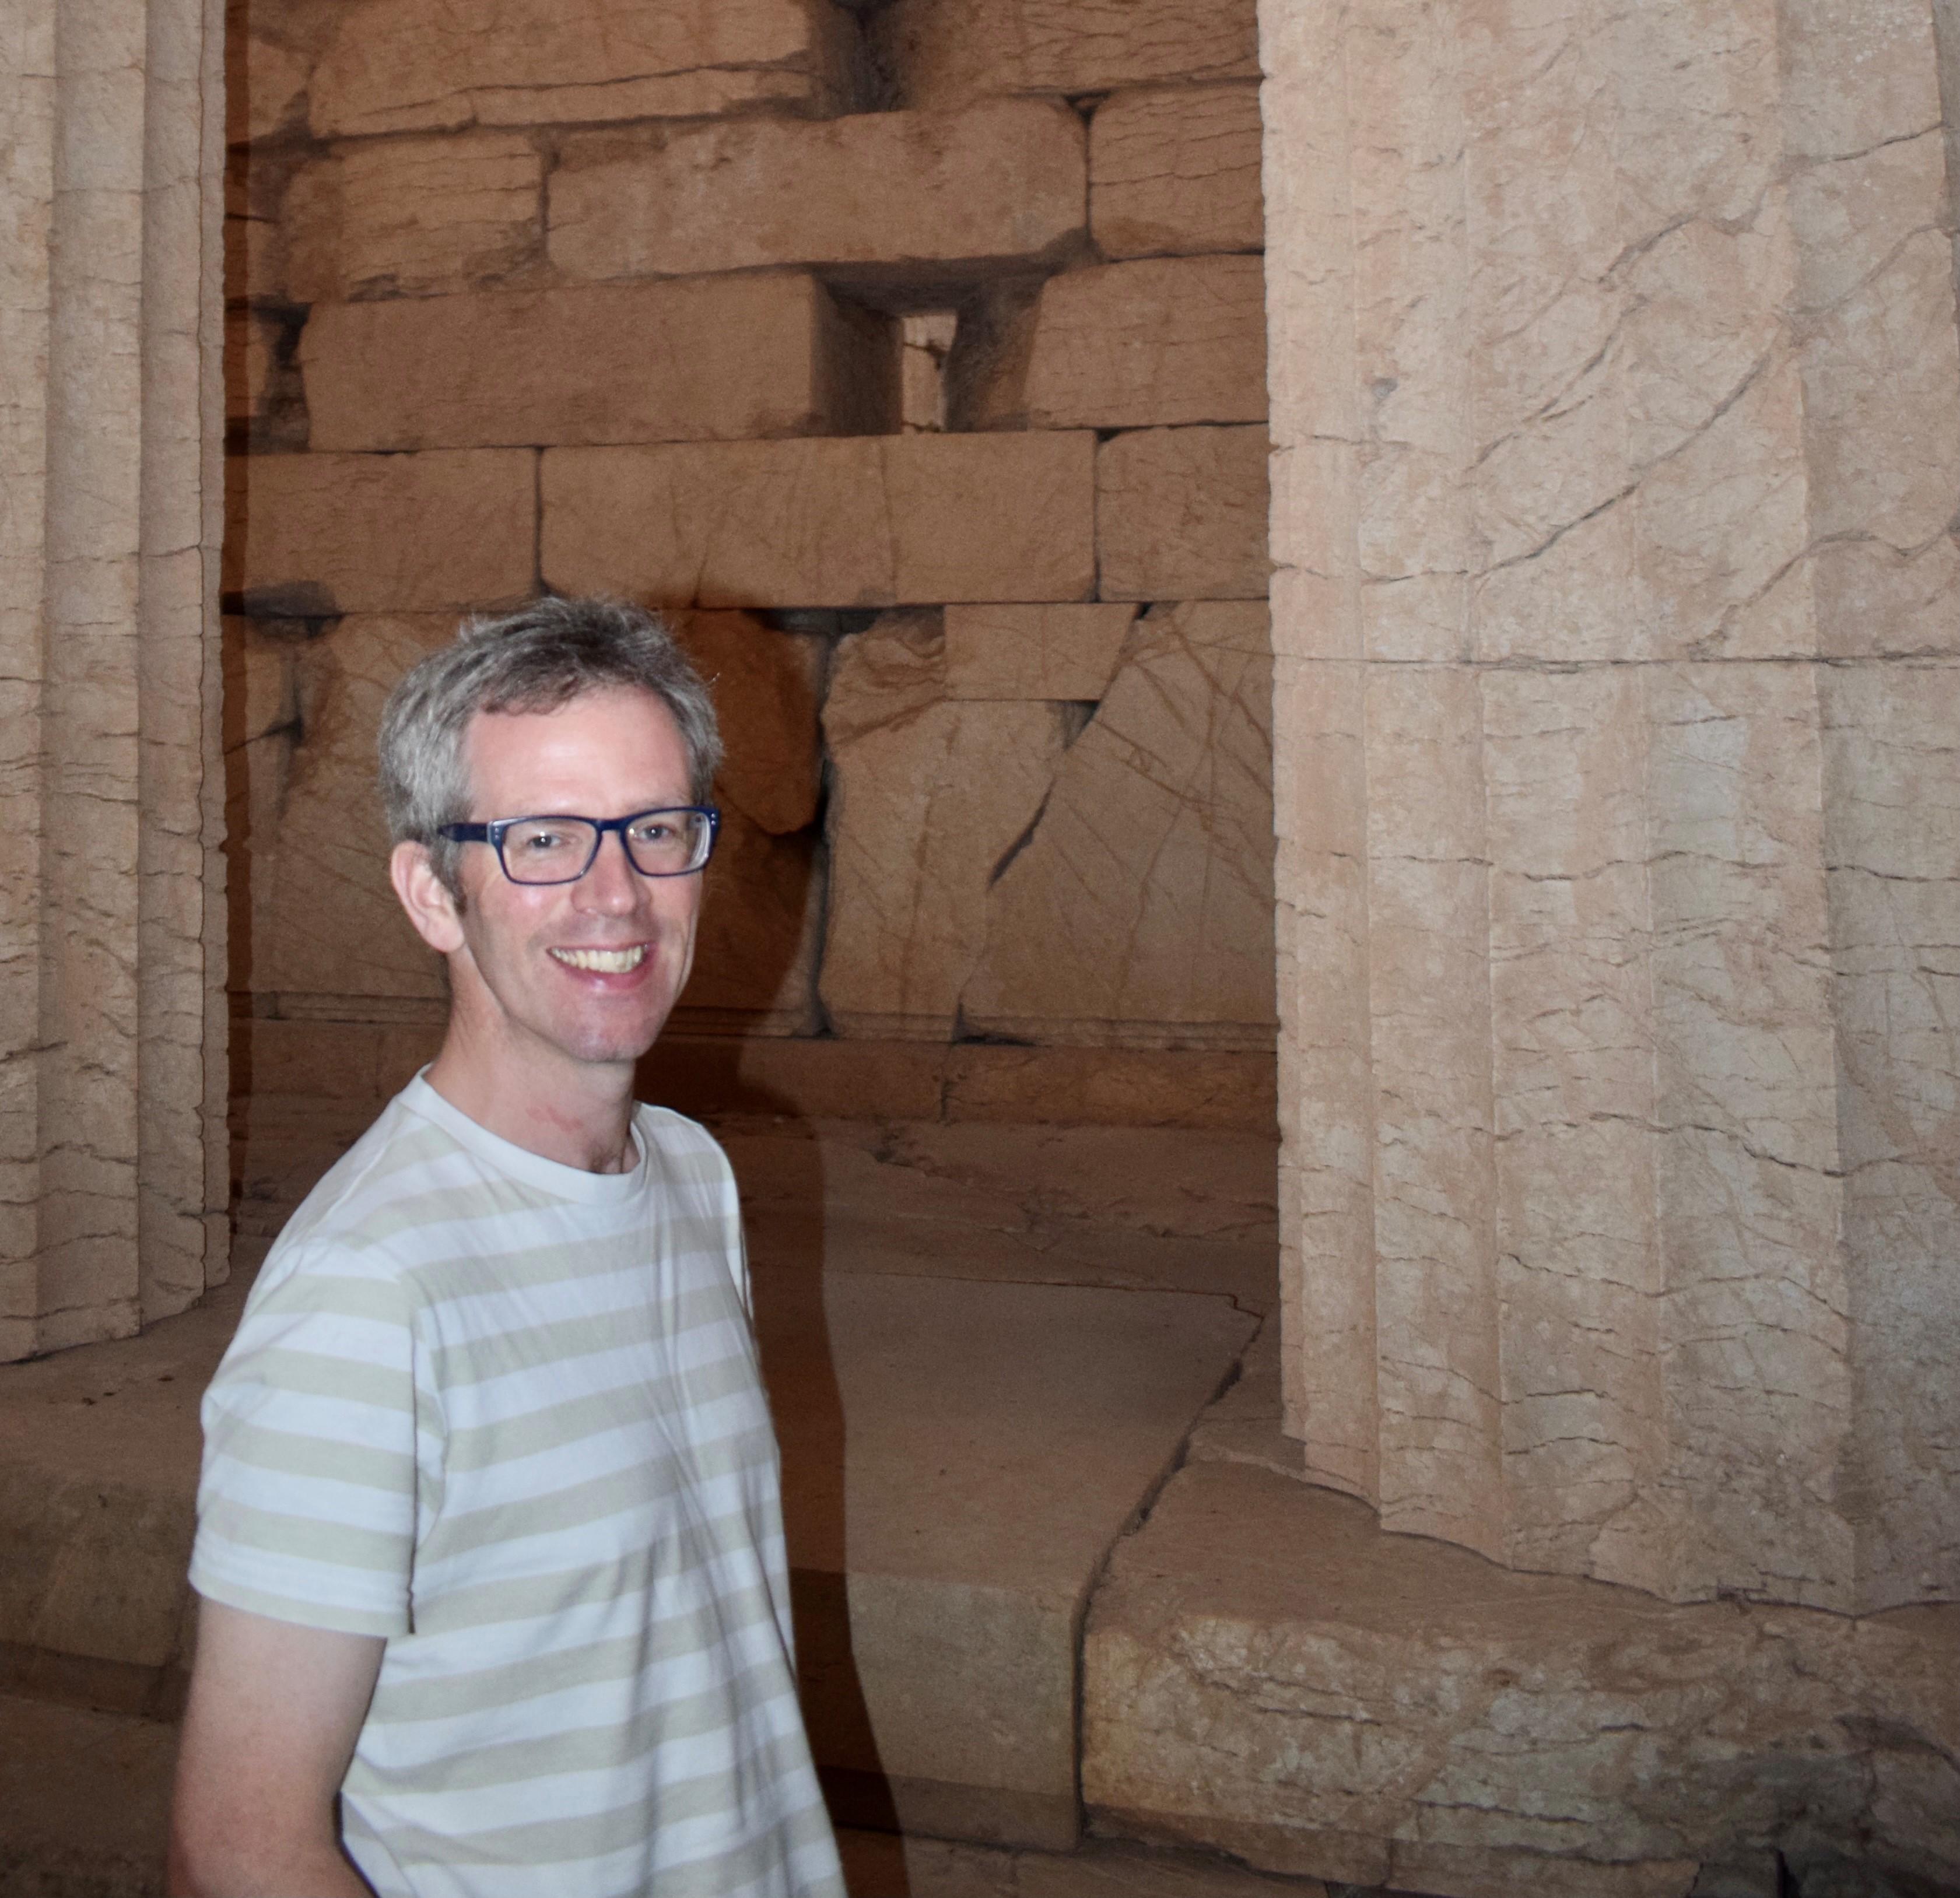 Professor Tim Whitmarsh at the Temple of Apollo at Bassae, Greece